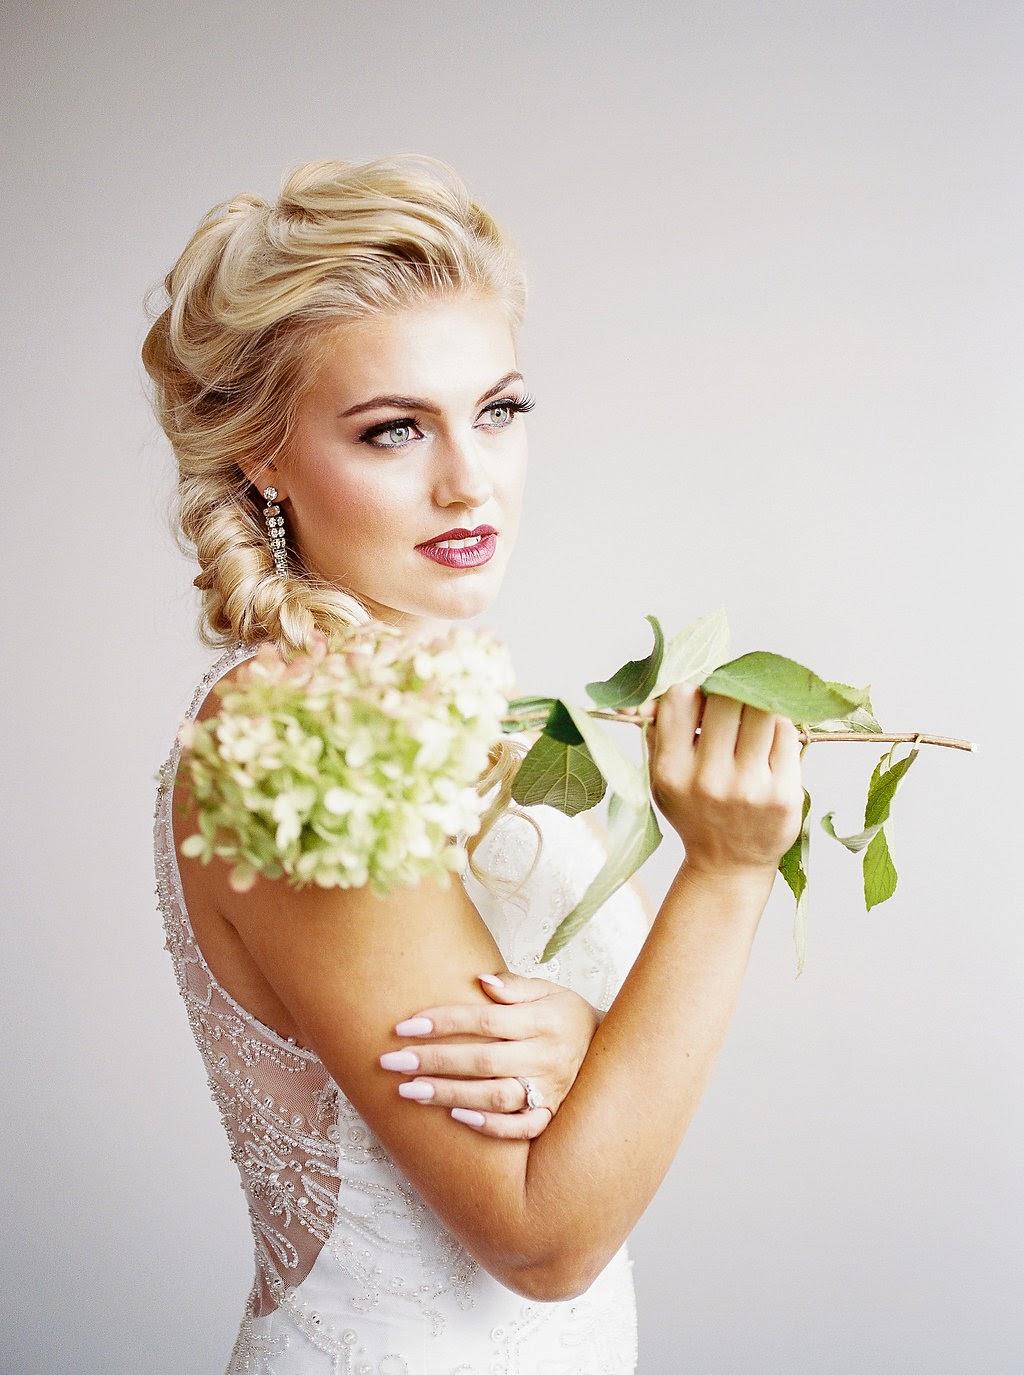 Alexandra-Elise-Photography-Ali-Reed-Film-Wedding-Photographer-185.jpg